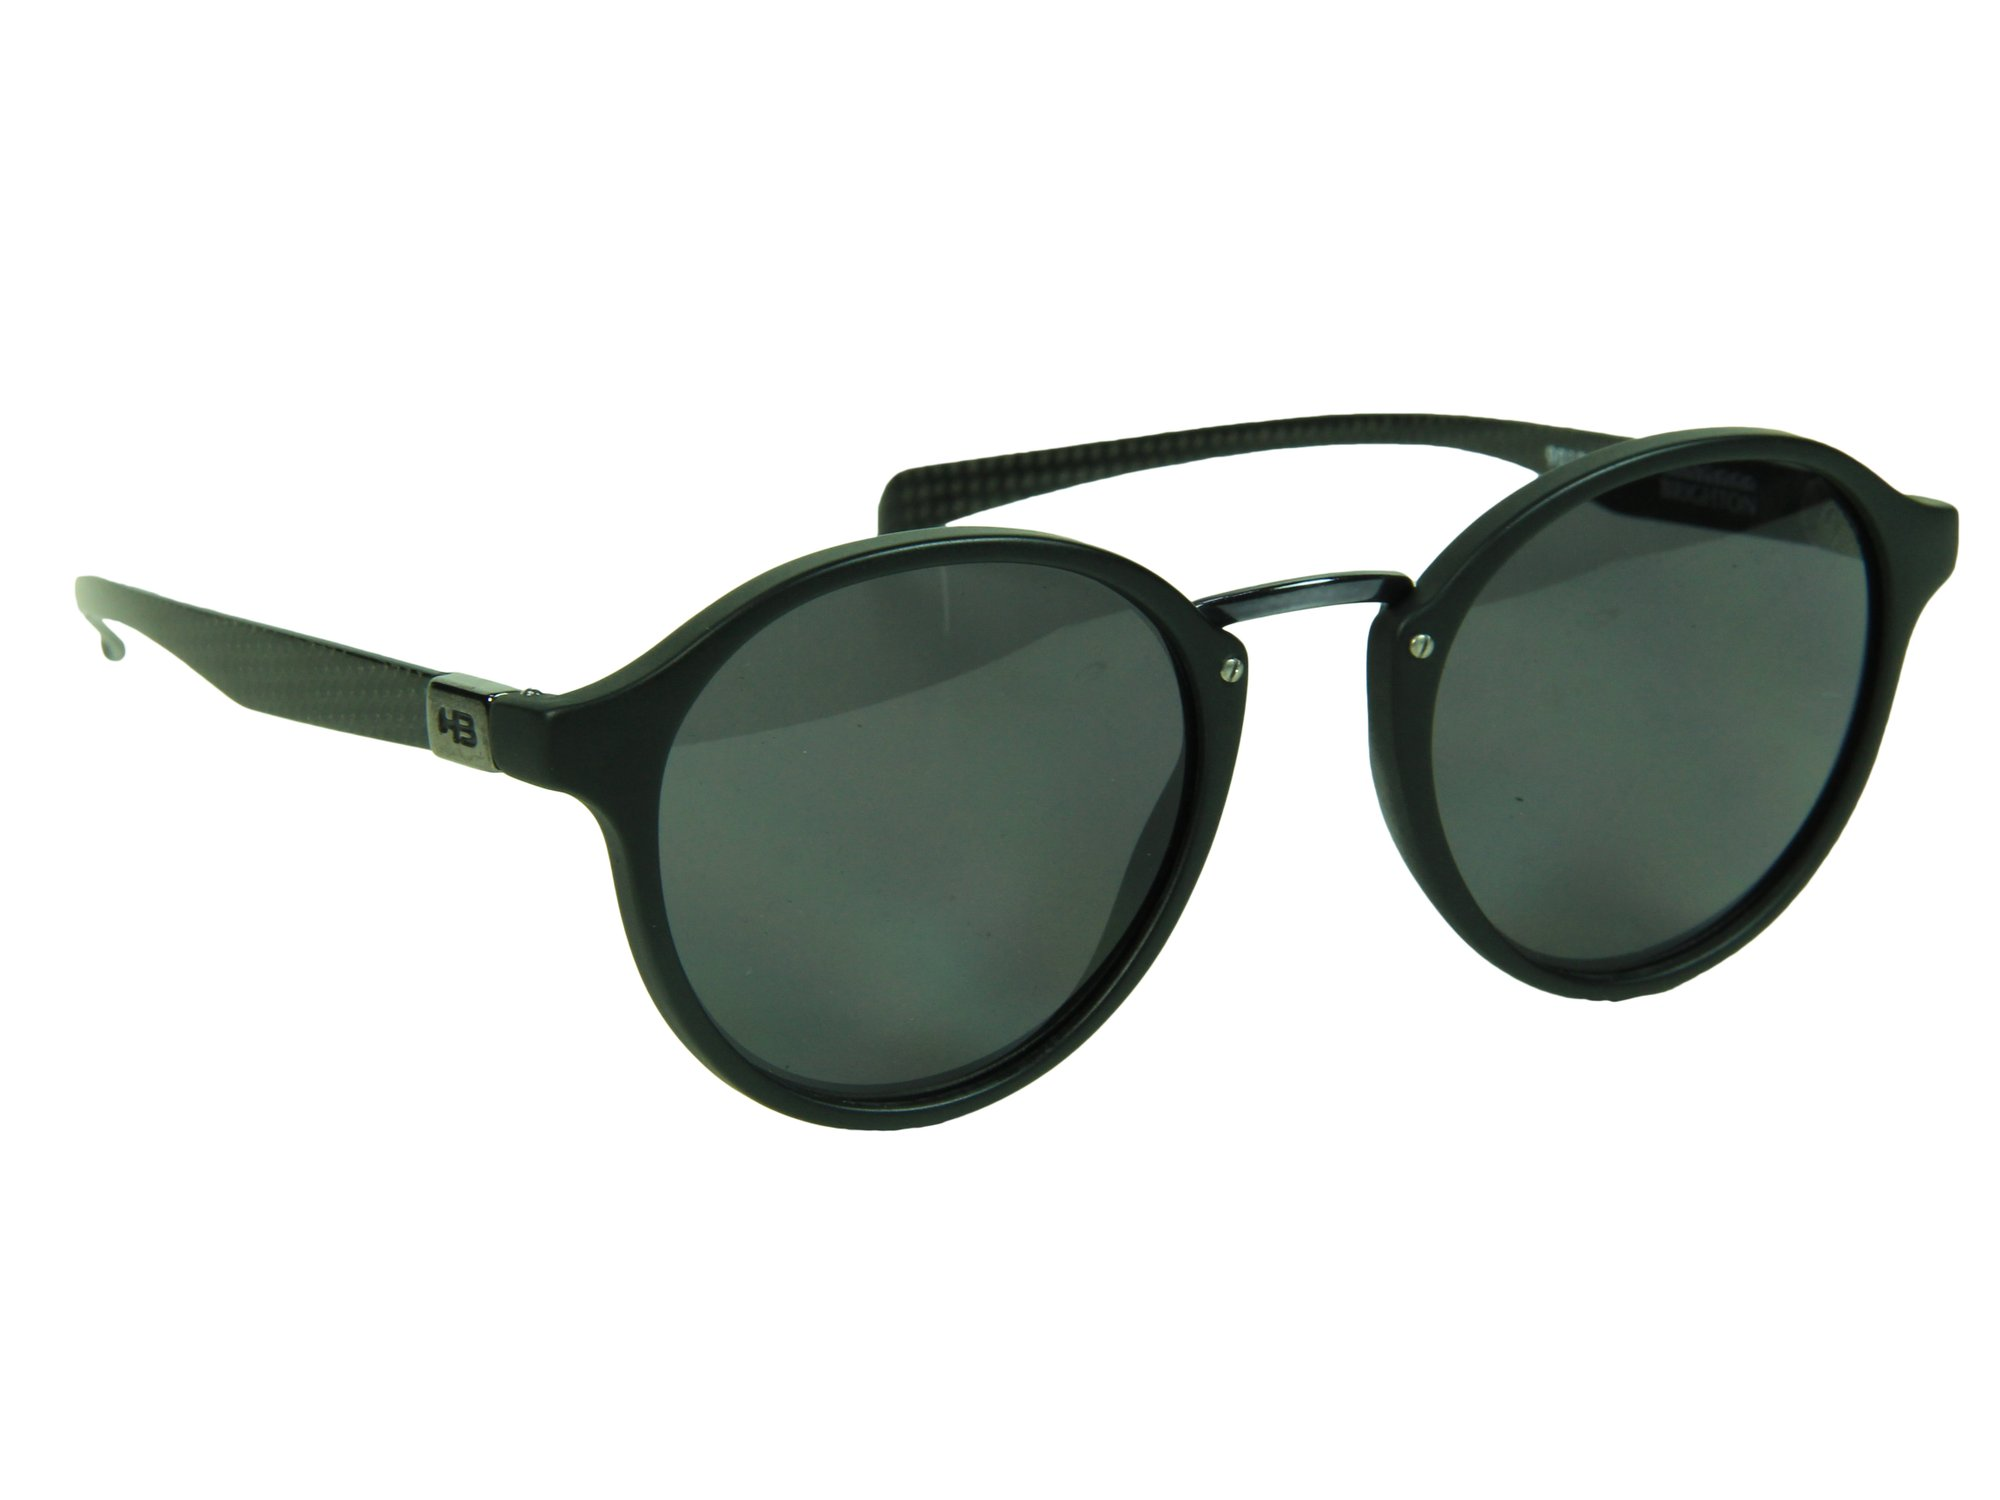 b82390f68feef Óculos de Sol HB Brighton Gray Lenses - Carbon Black Matte - Session ...